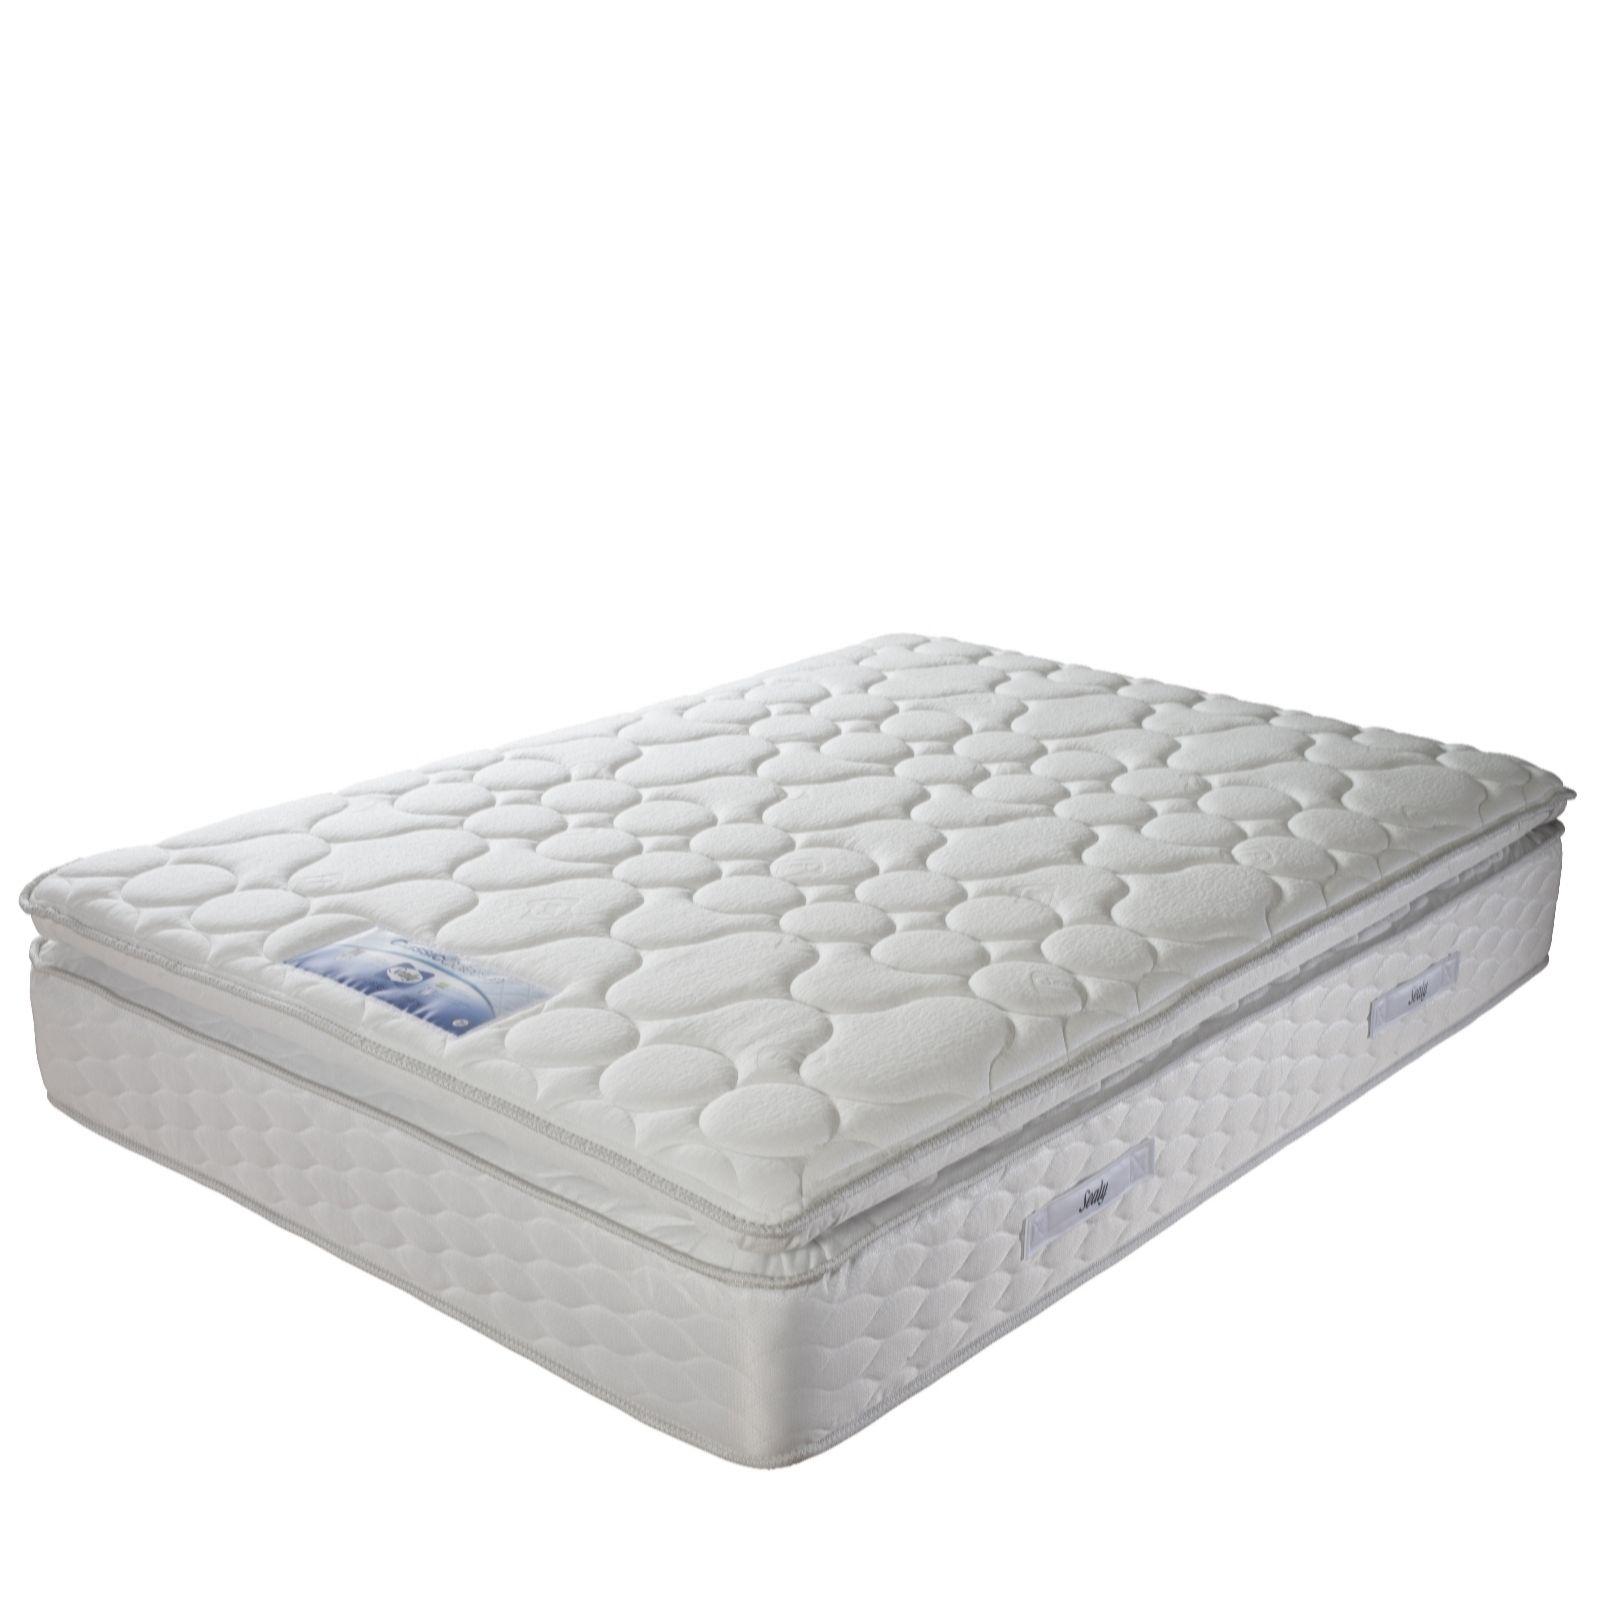 Sealy Posturepedic Gel Supreme 1400 Springs Pillowtop